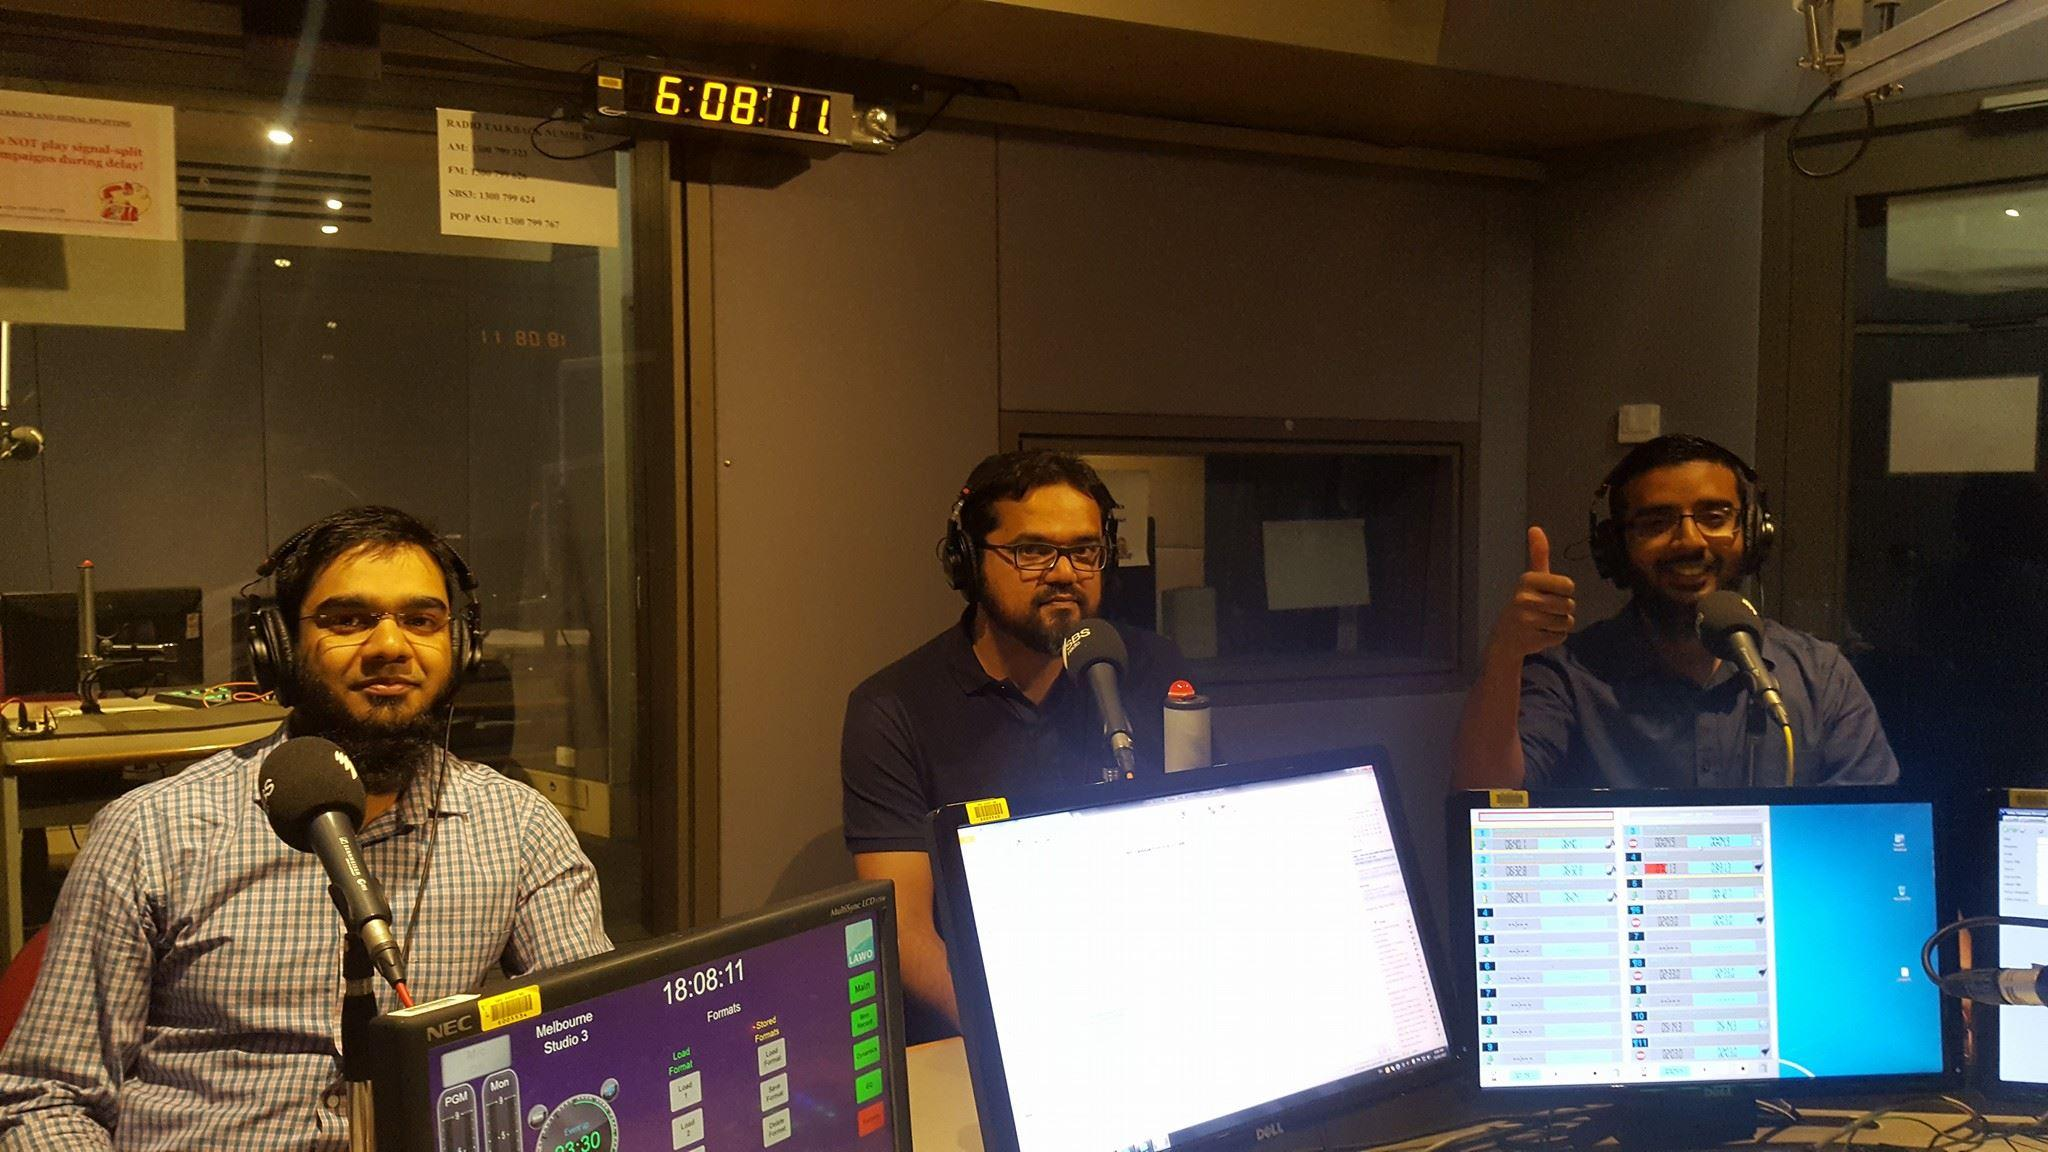 Melbourne Madina volunteers Farooq Syed, Abdul Aziz and Faizan Zia